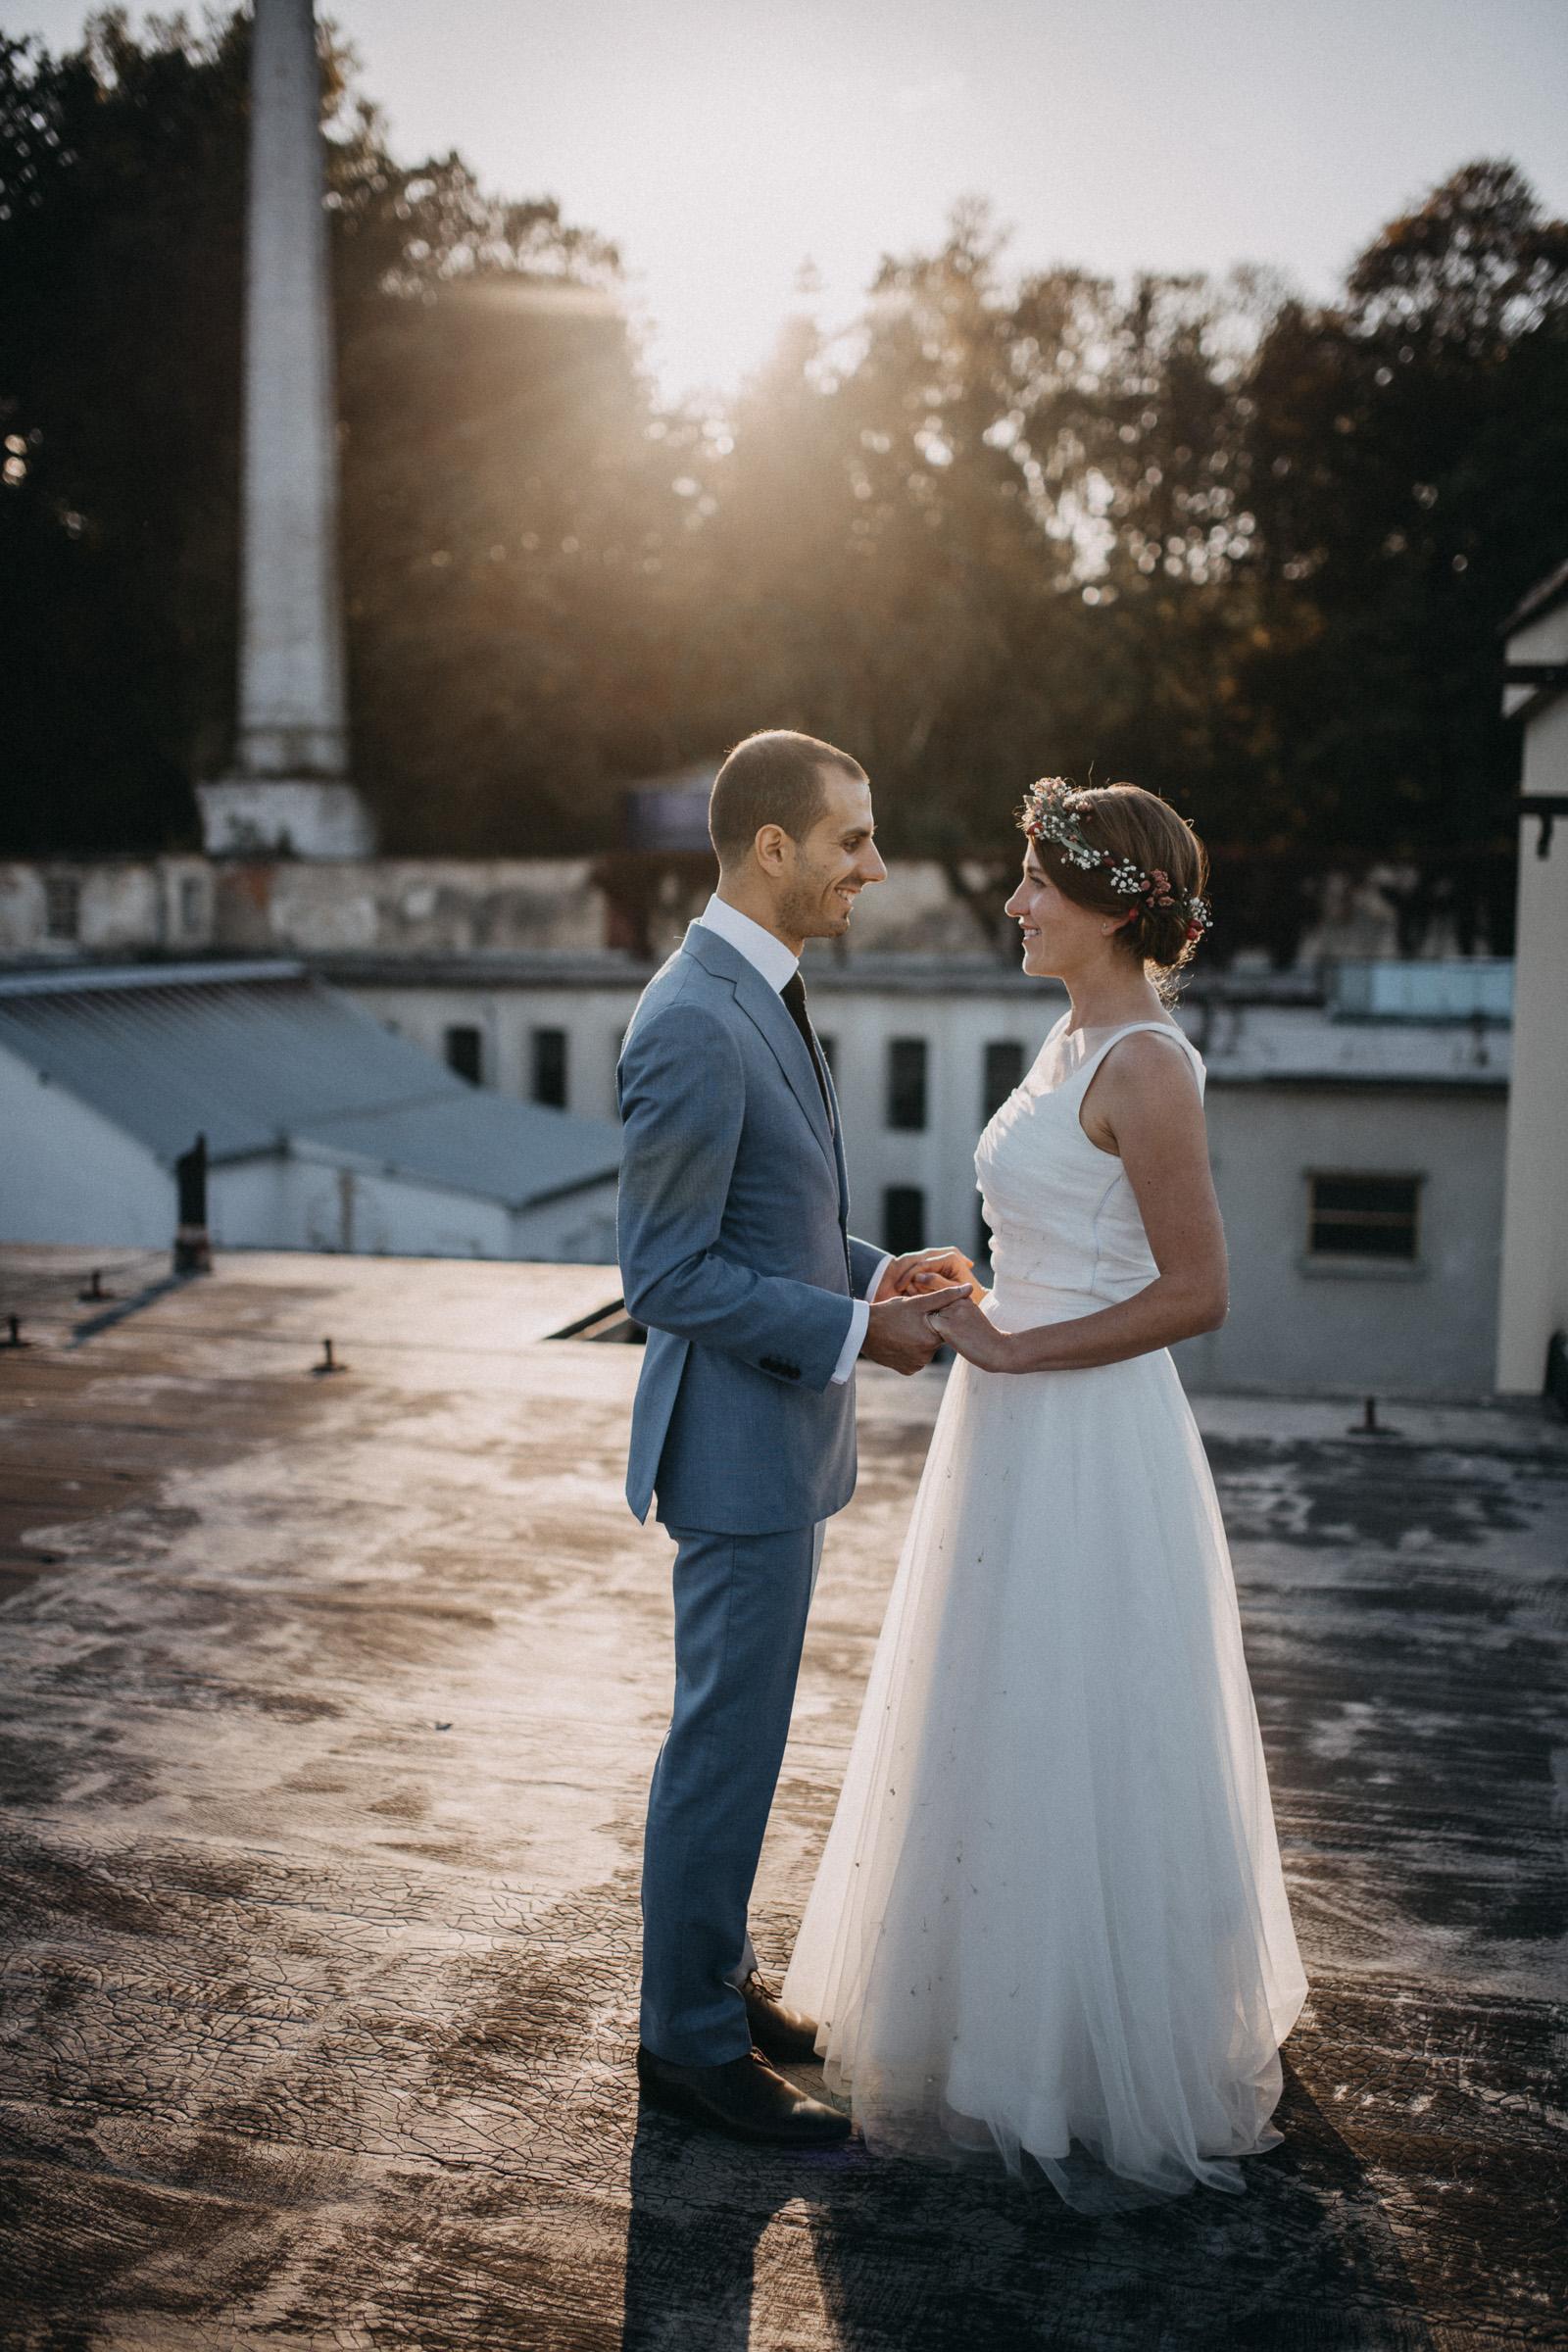 Industrial wedding_098.jpg